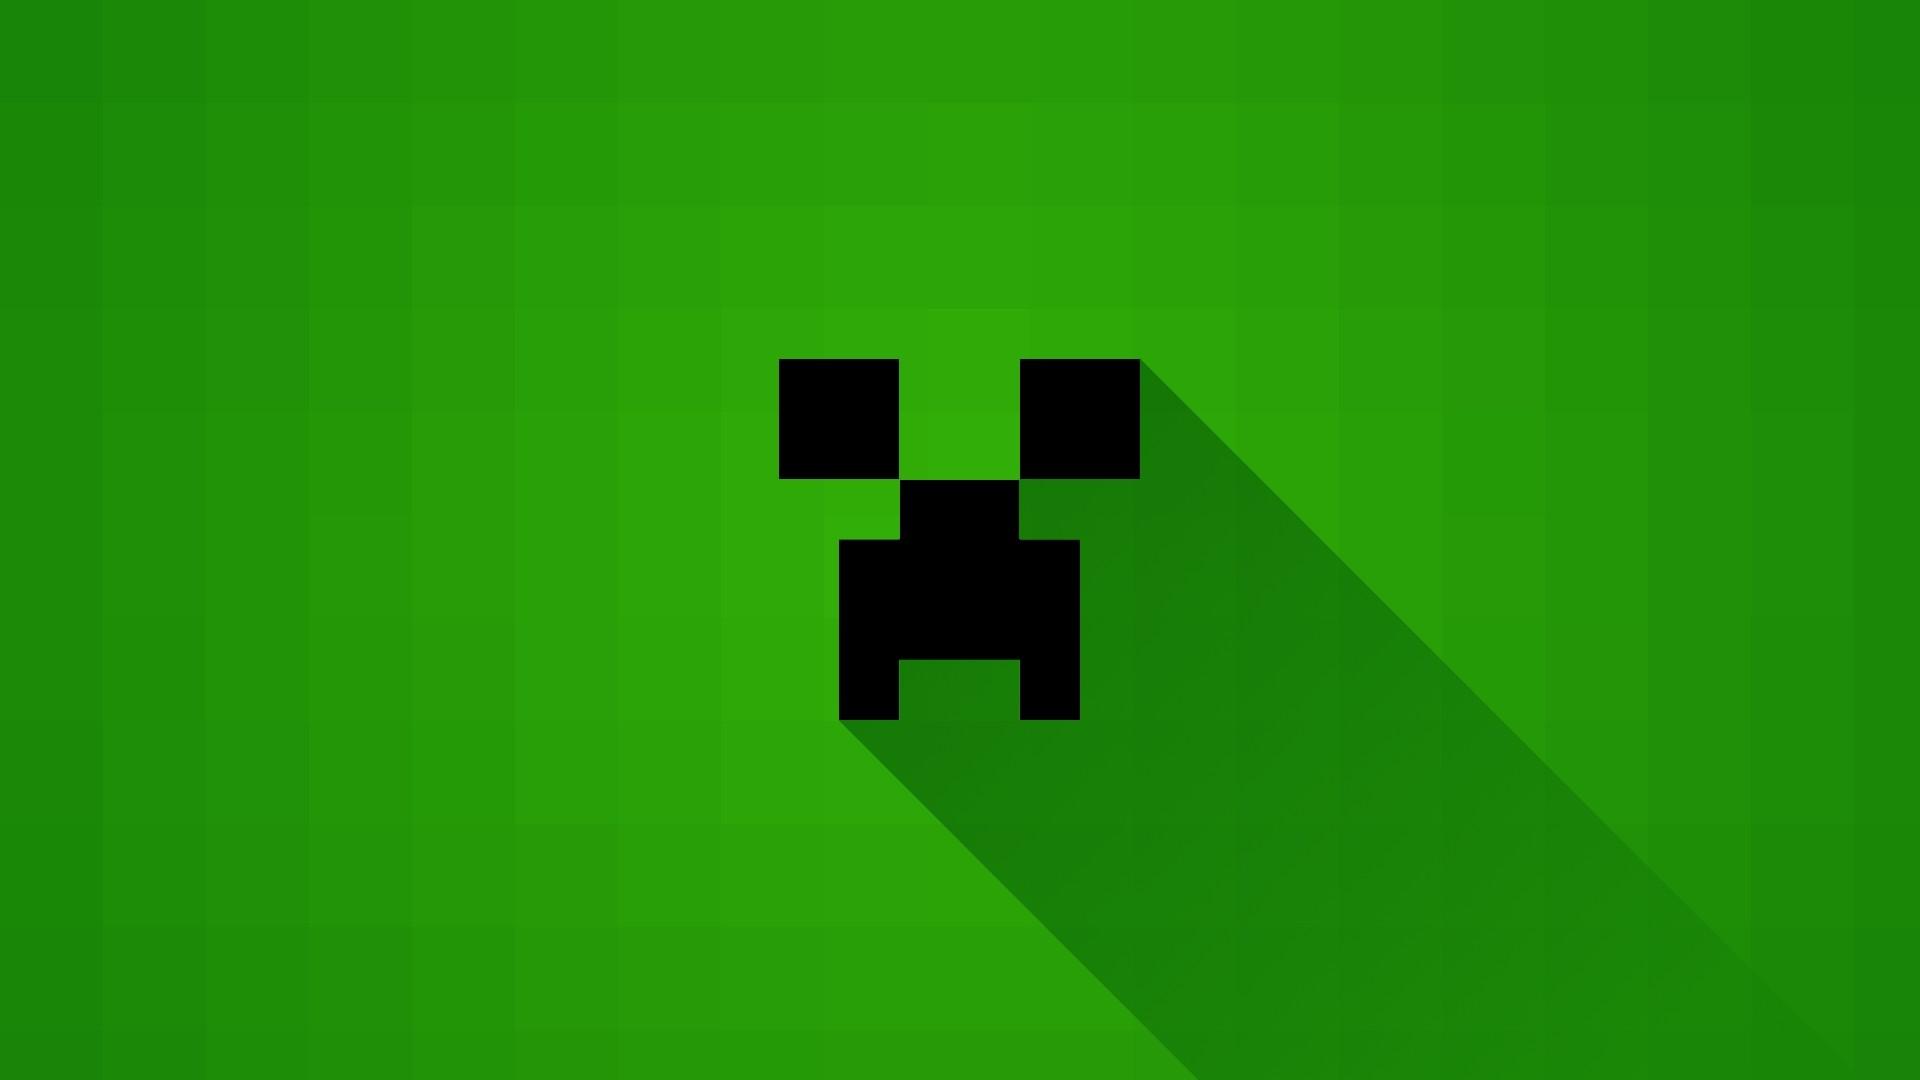 Creeper Wallpaper Hd Minecraft Creeper Backgrounds 183 ①